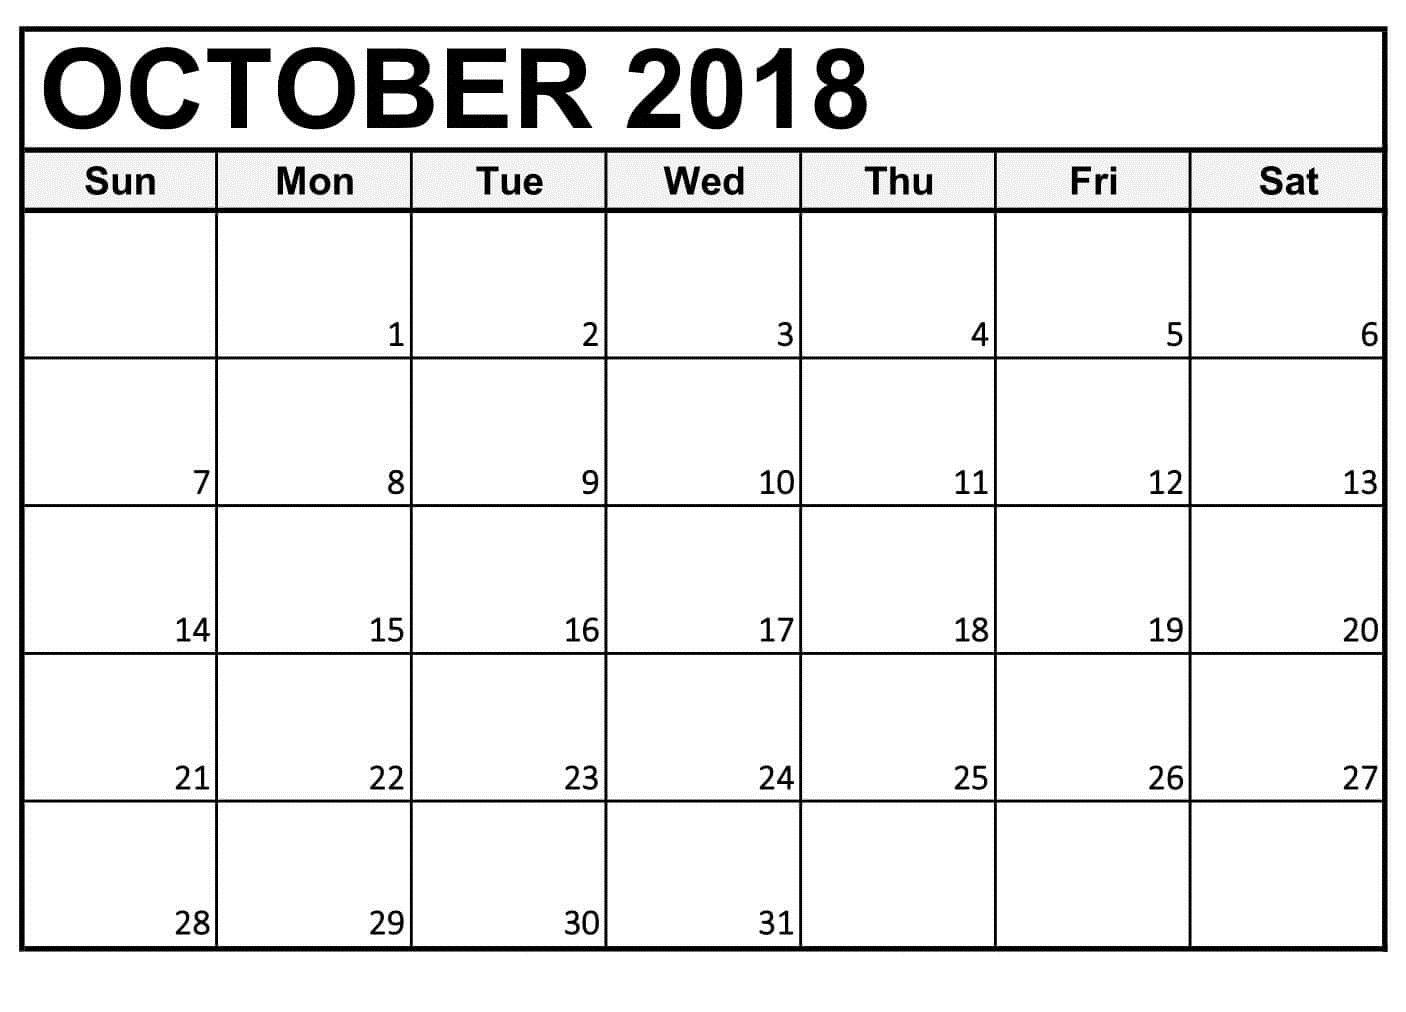 Free Printable Calendar October 2018 Large Numbers